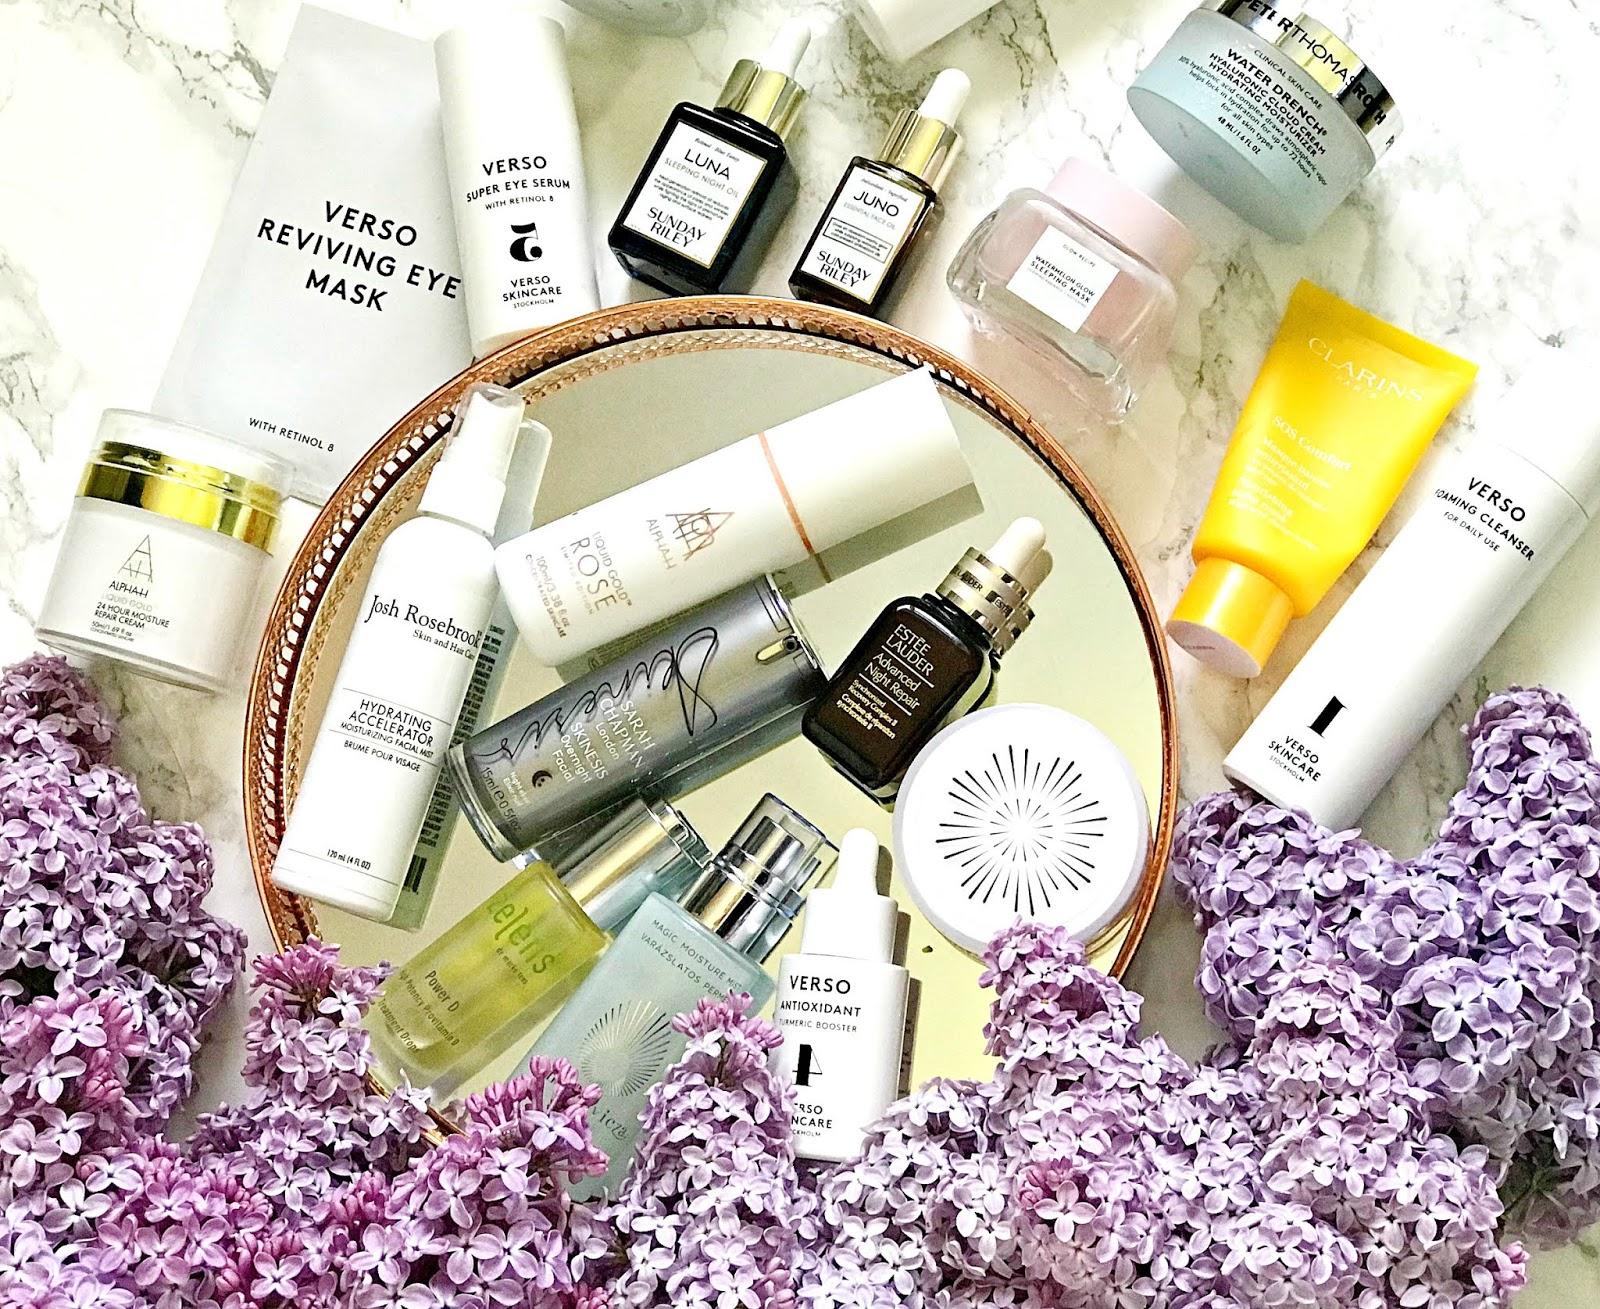 Skincare, Cult Beauty, Debenhams, Fragrance Direct, World Duty Free, Look Fantastic, Space NK, Luxury Skincare,  Luxury Skincare for less